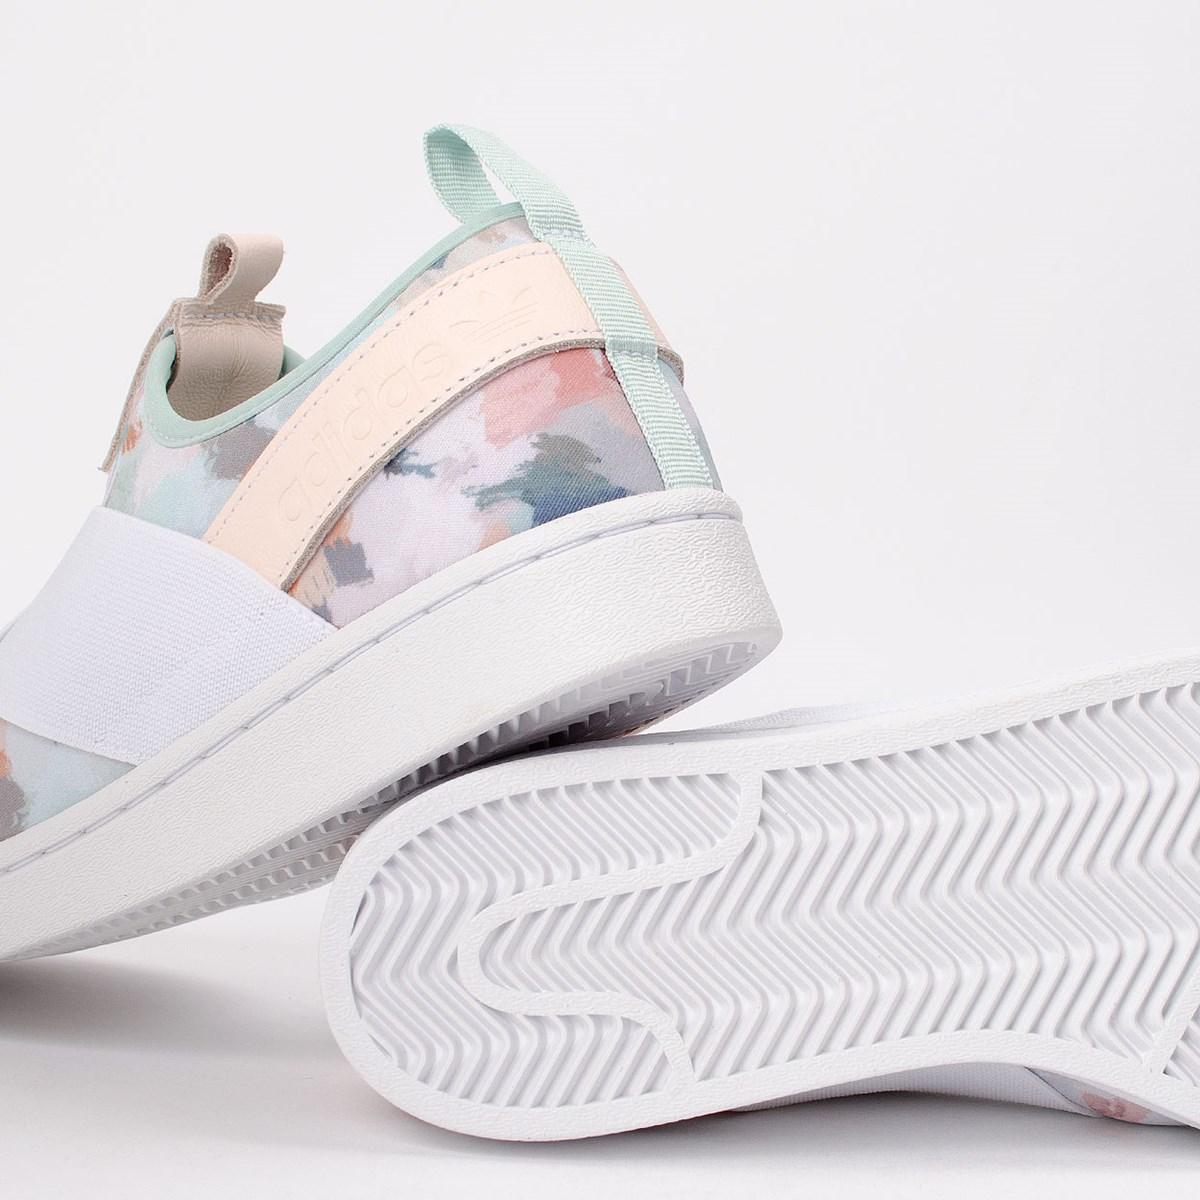 Tênis adidas Superstar Slip On Suplier Colour EY1121